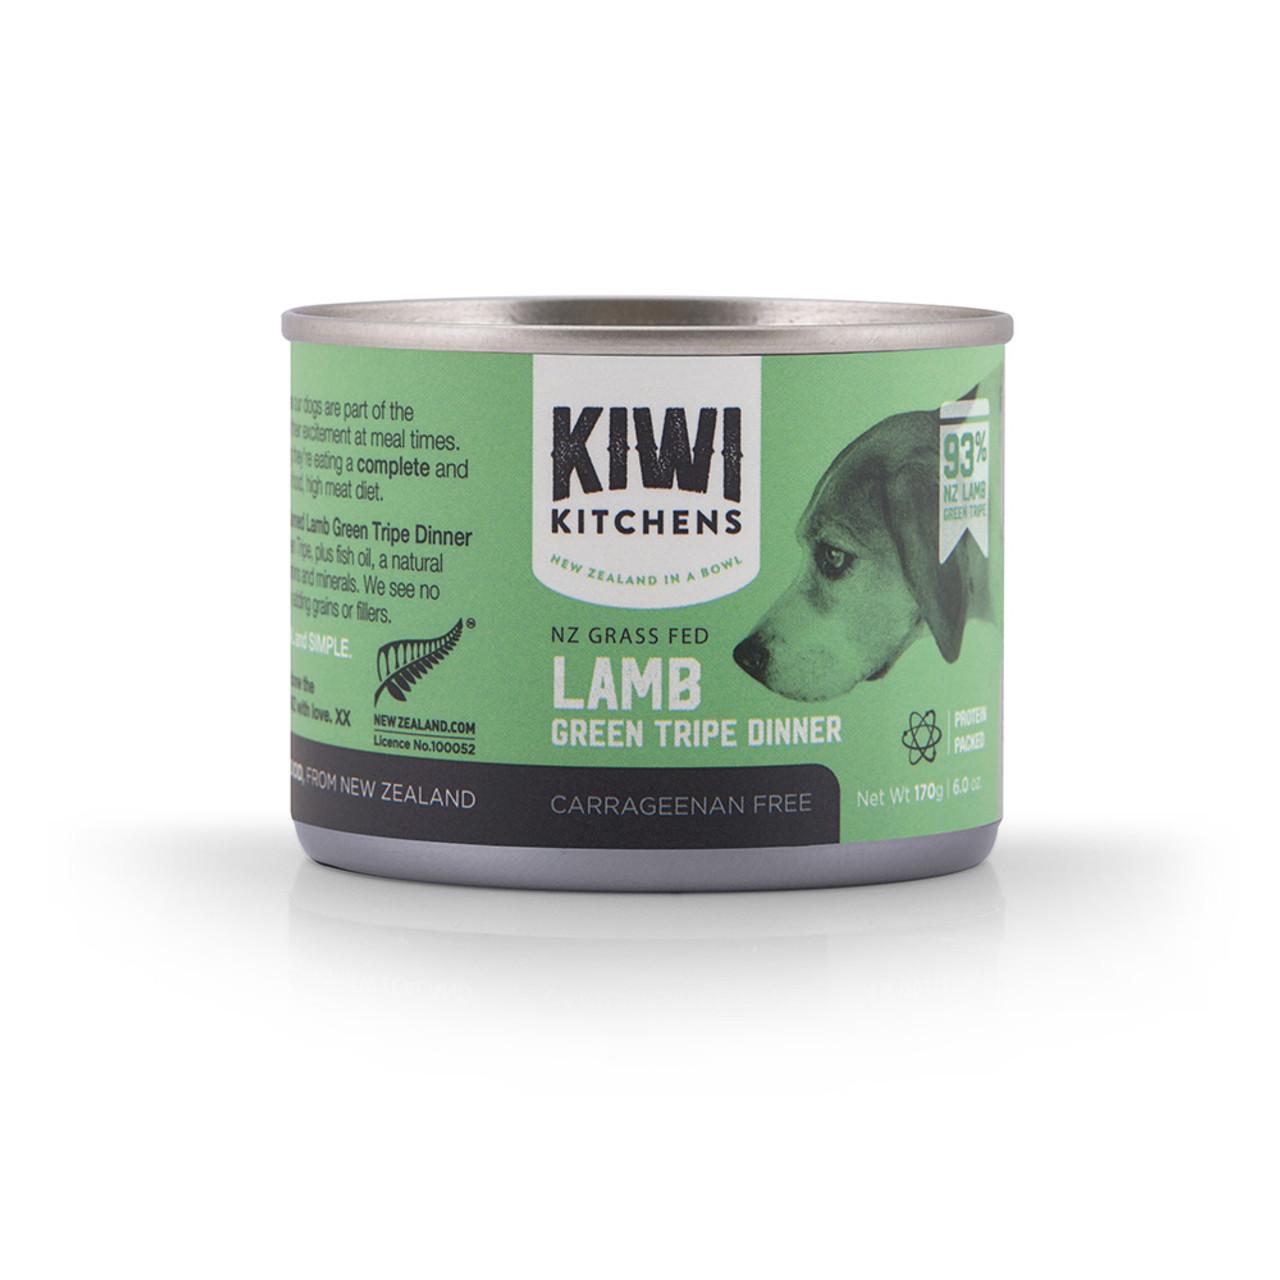 Kiwi Kitchens Grass Fed Lamb Green Tripe Dinner Canned Dog Food